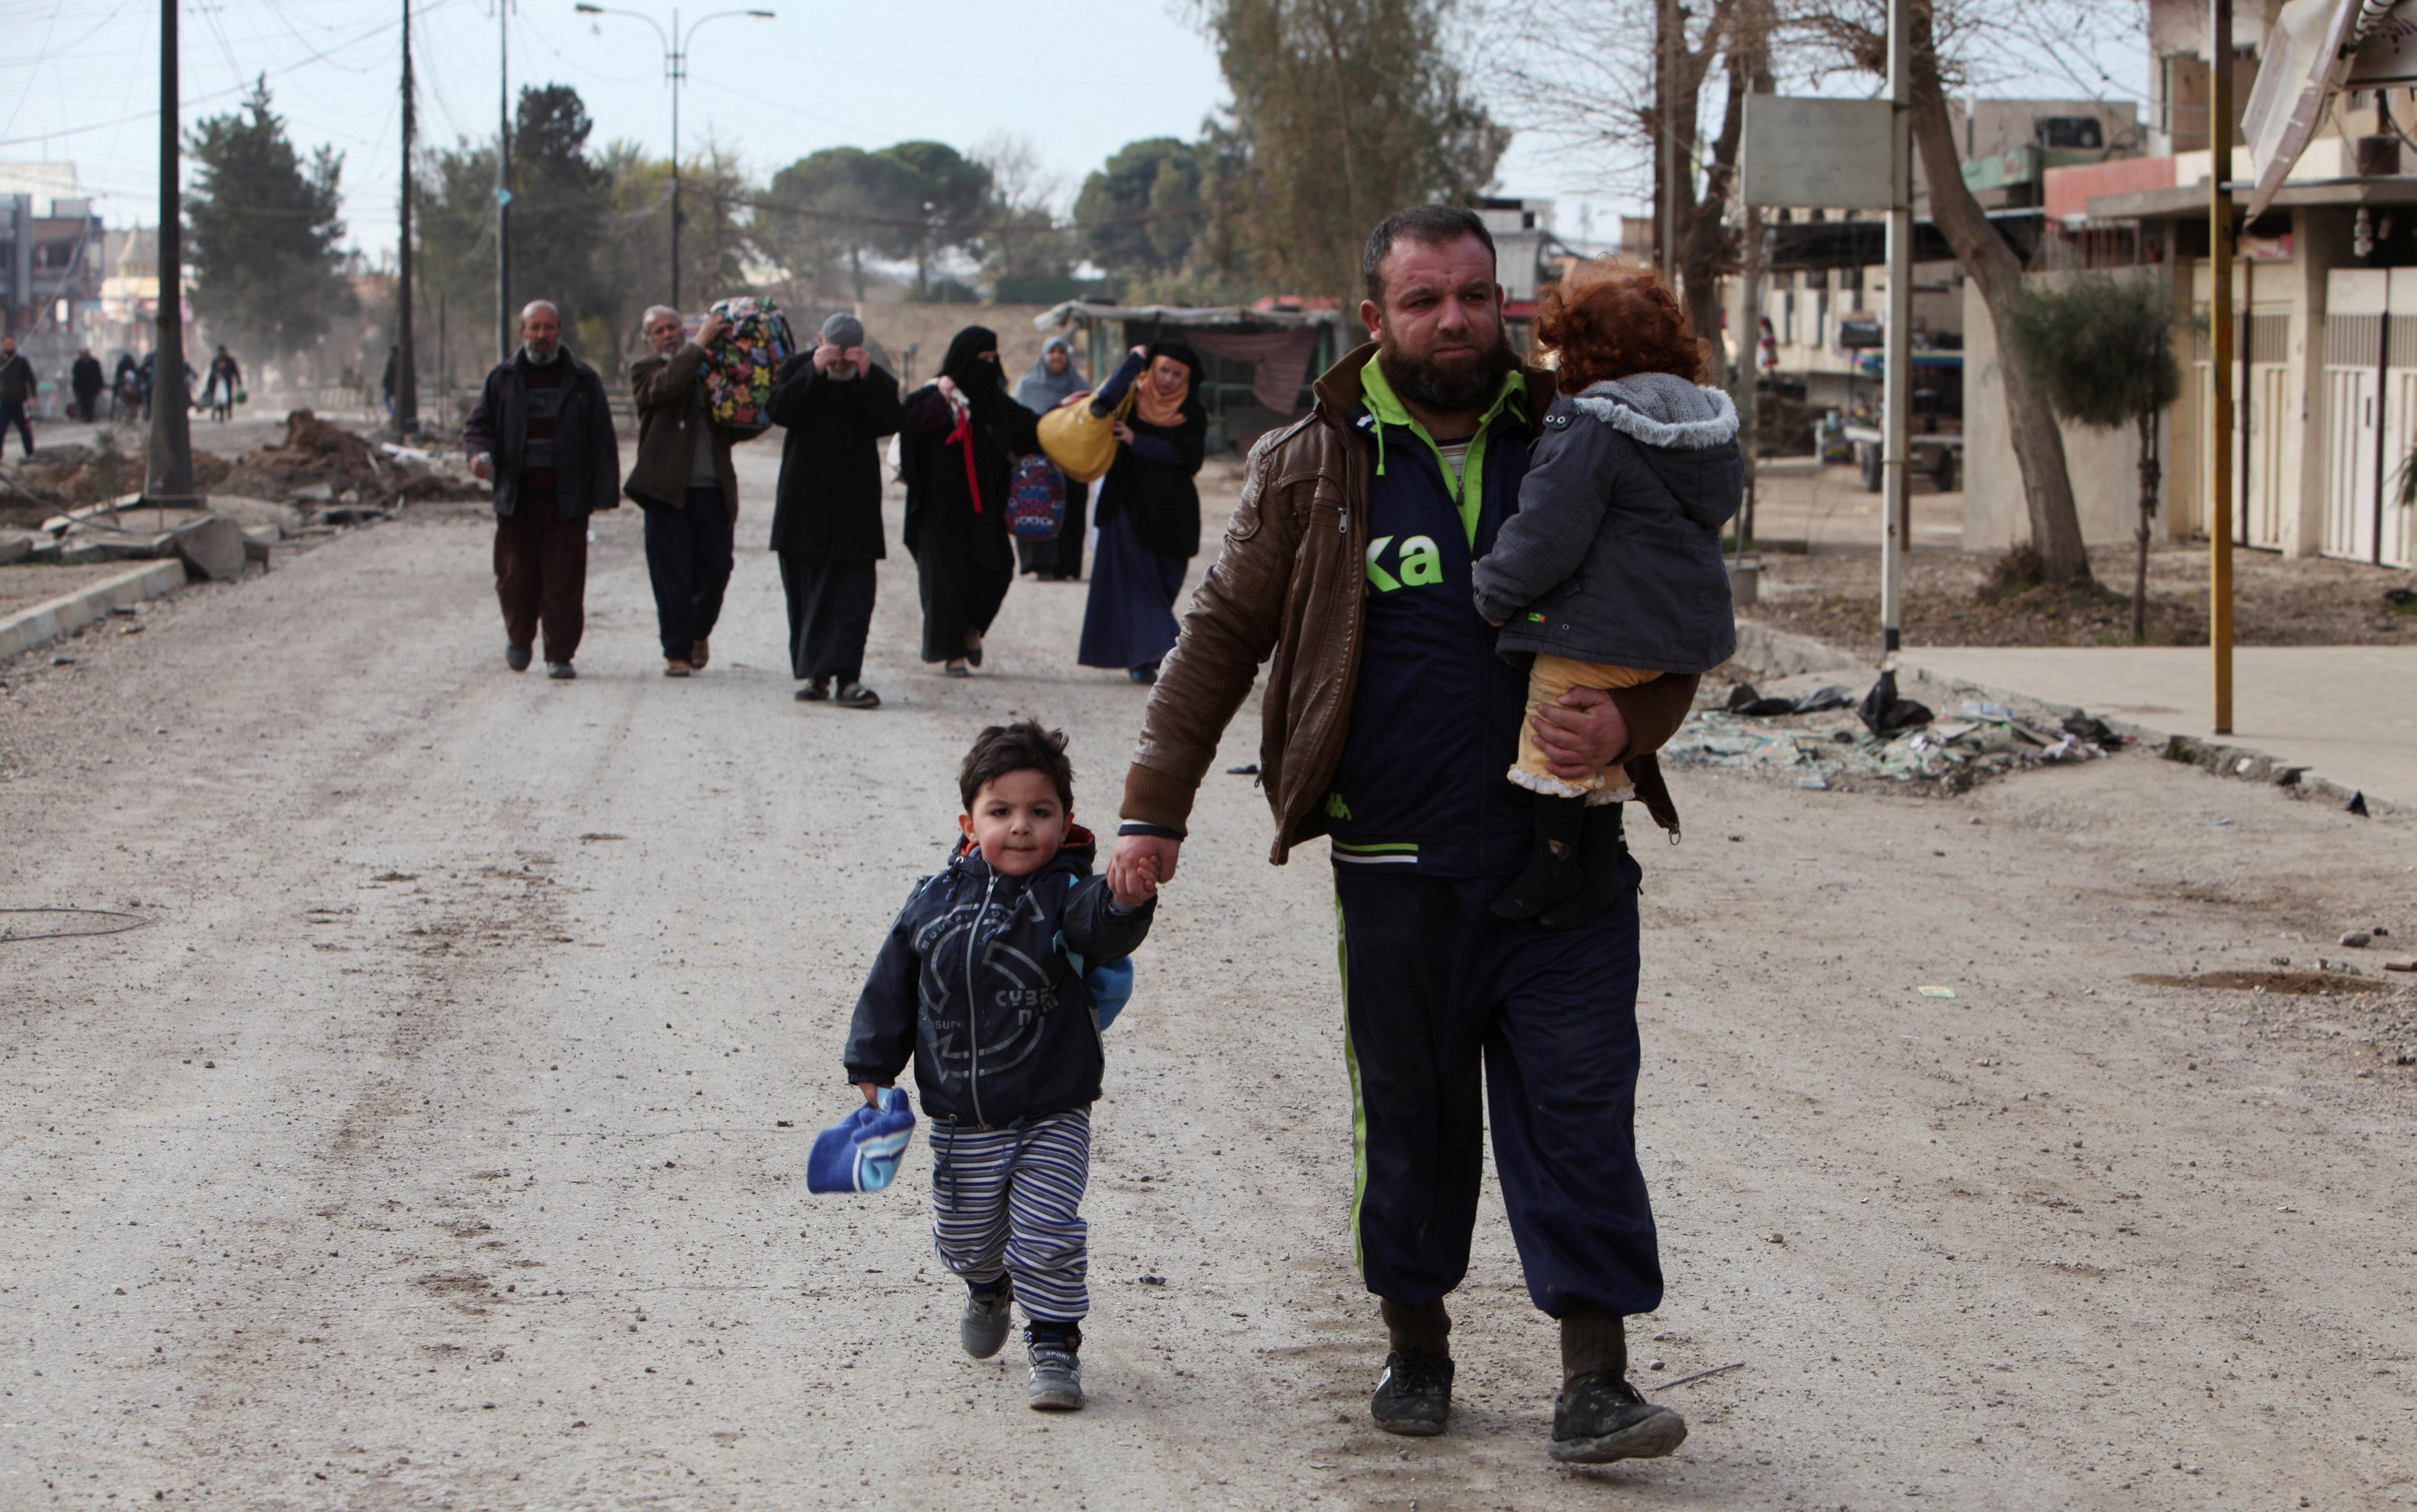 Iraqi forces fight Islamic State near ancient site in Mosul - Iraqi...